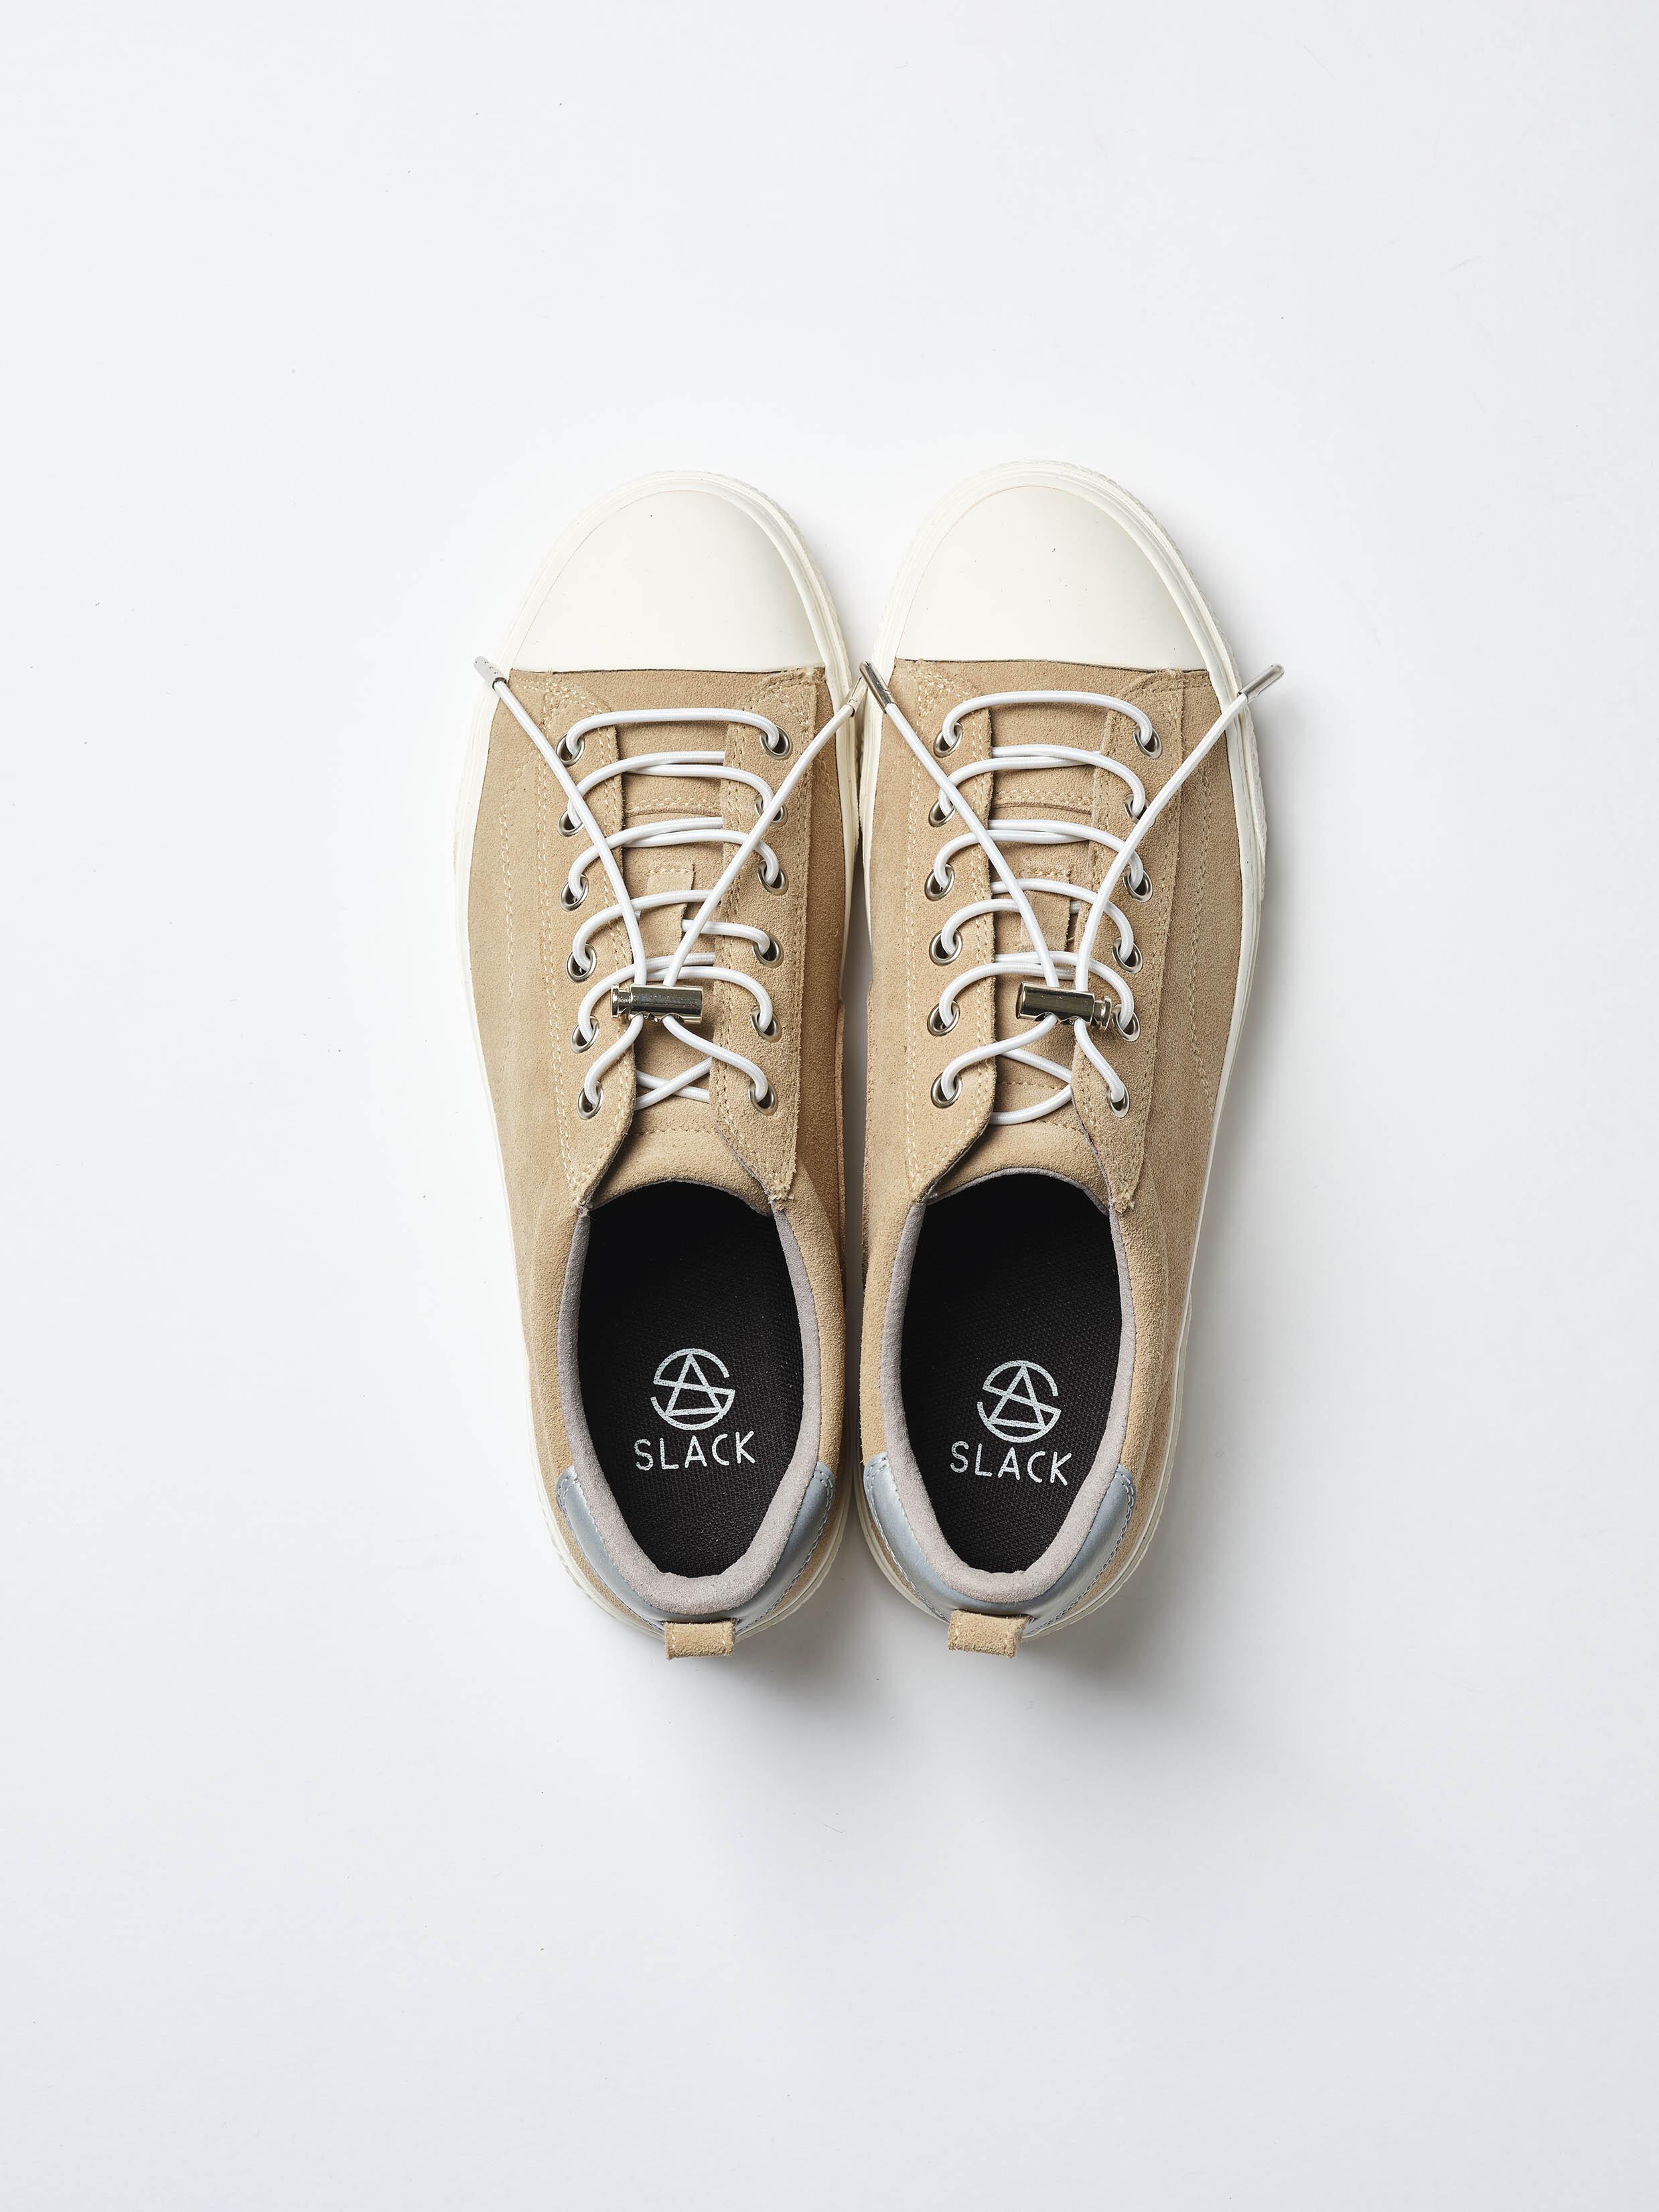 SLACK FOOTWEAR / CLUDE PREMIUM SUEDE(BEIGE/WHITE)